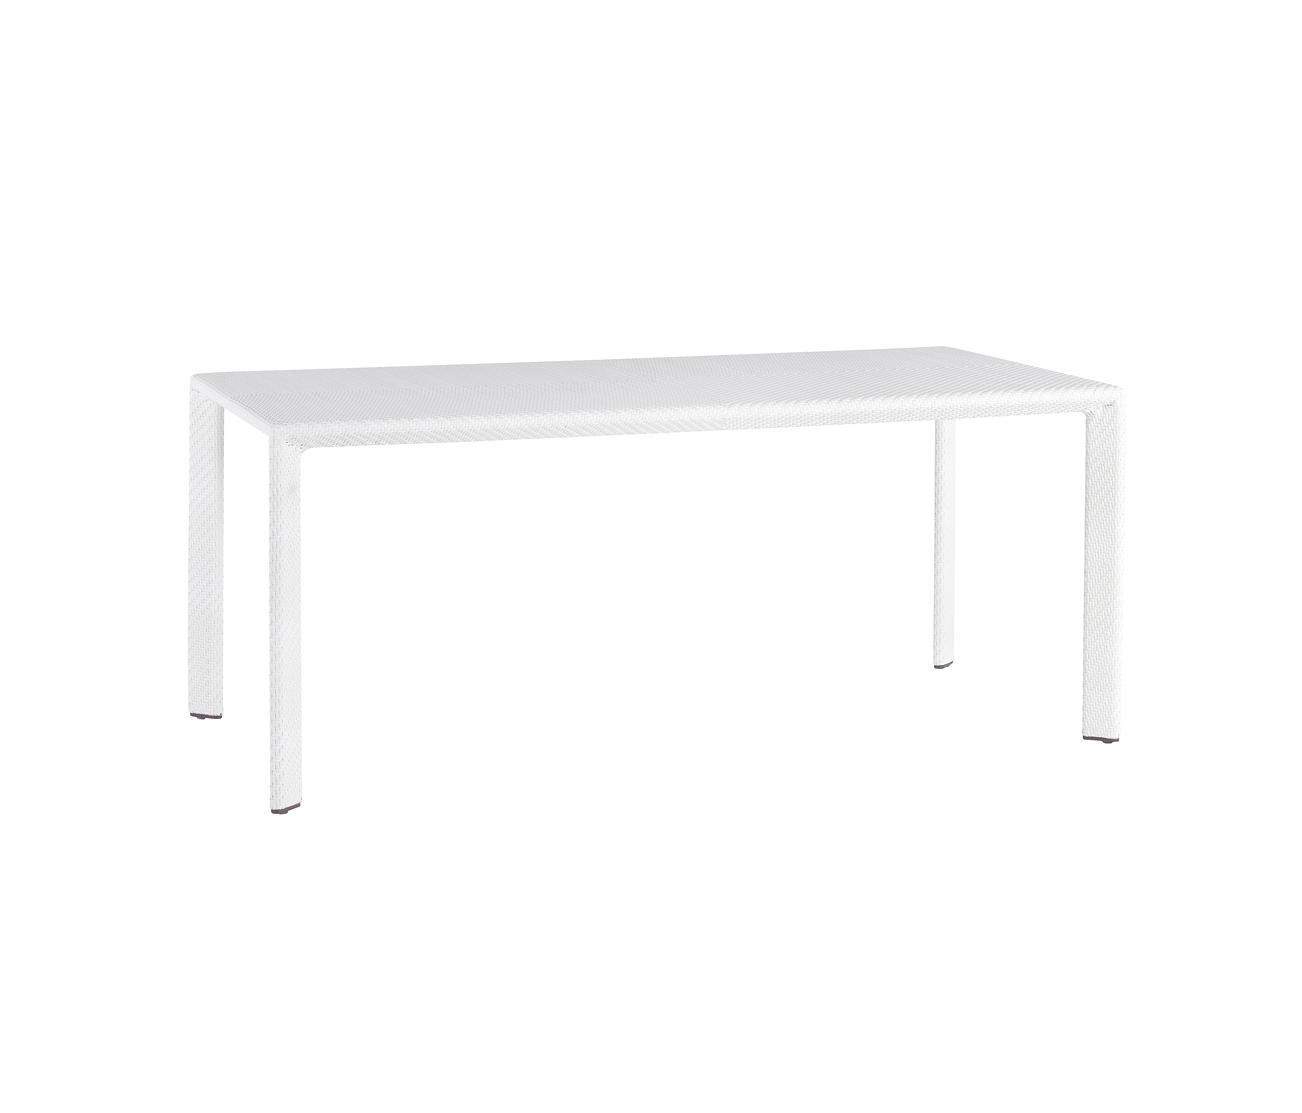 Angul mesa comedor rectangular mesas de comedor de for Comedor rectangular